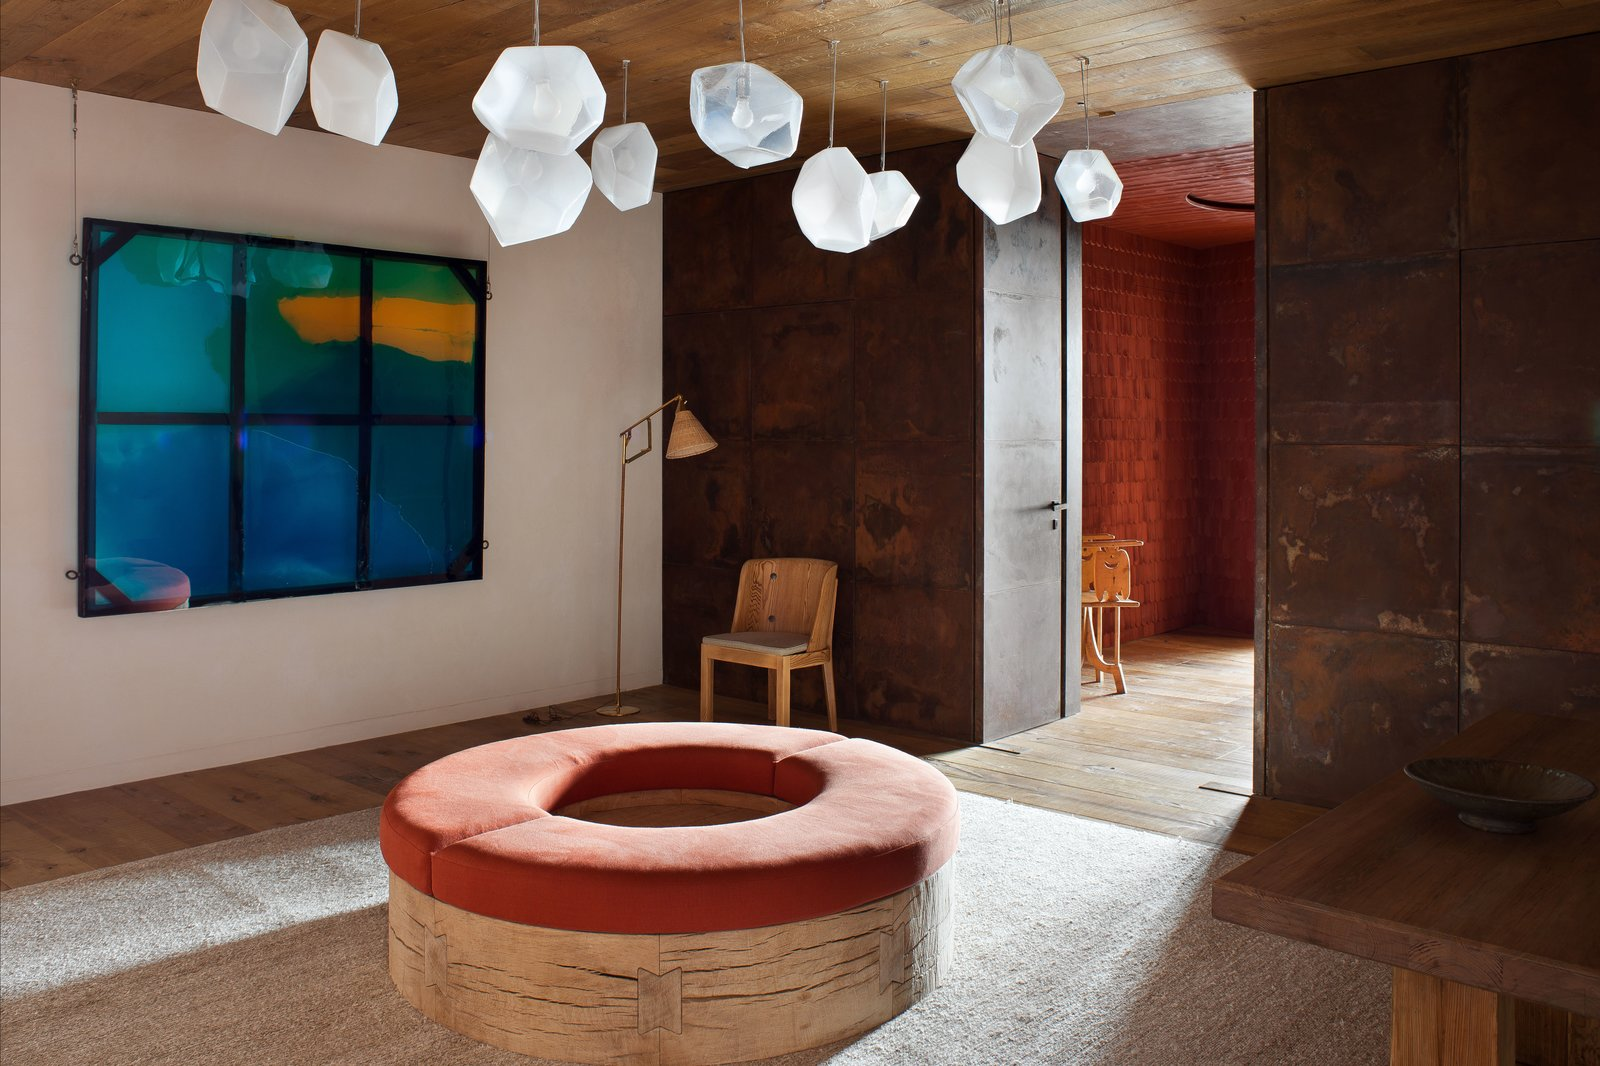 Hallway And Light Hardwood Floor Hand N Salt Crystal Lights By Jeff Zimmerman Hang Above